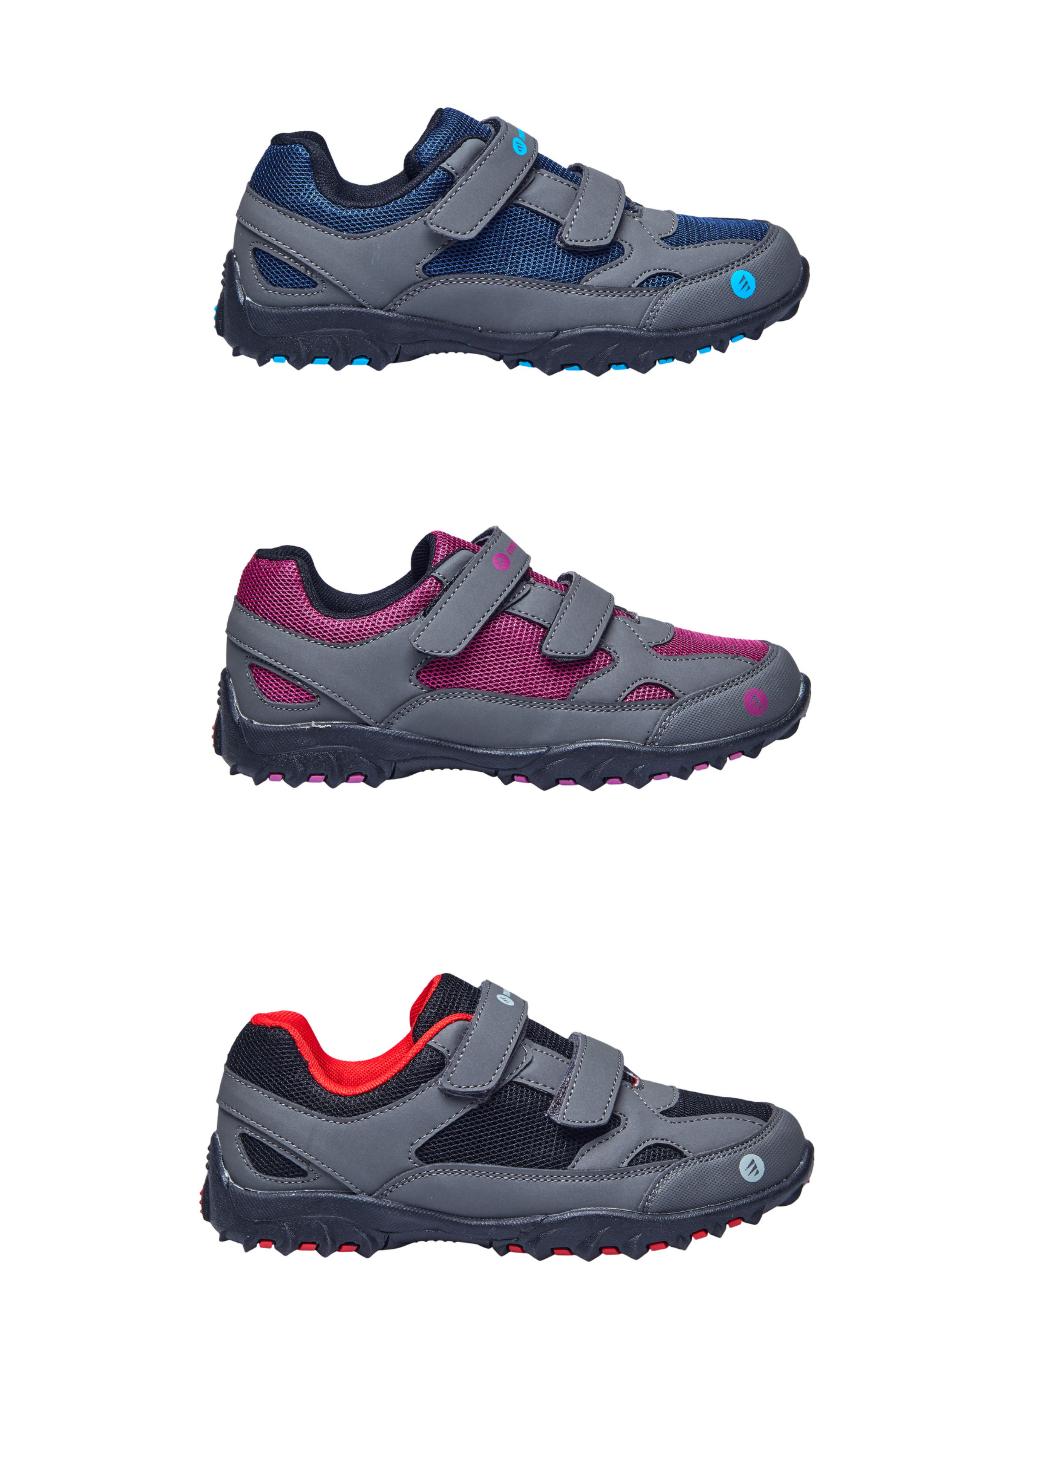 Zapatillas de montaña Para niños solo 4.9€